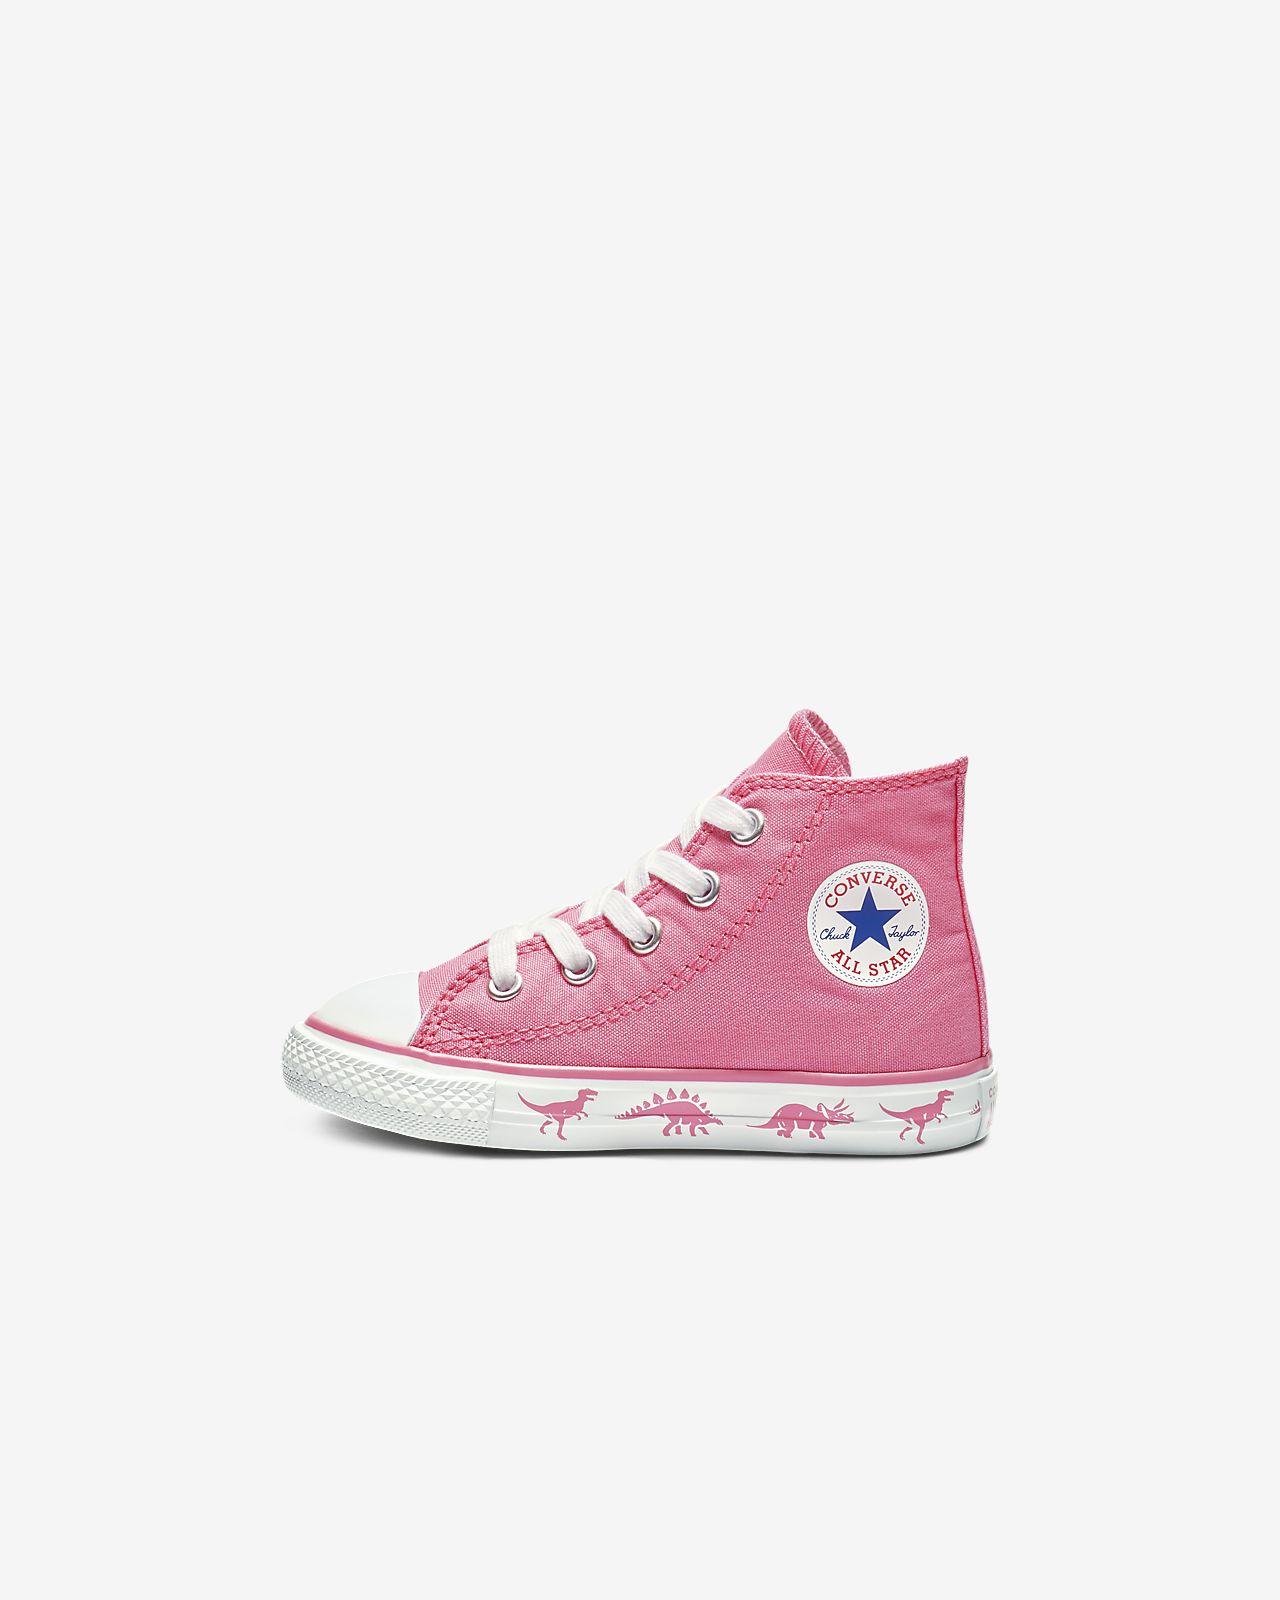 Converse Chuck Taylor All Star Dinoverse Toddler Shoe